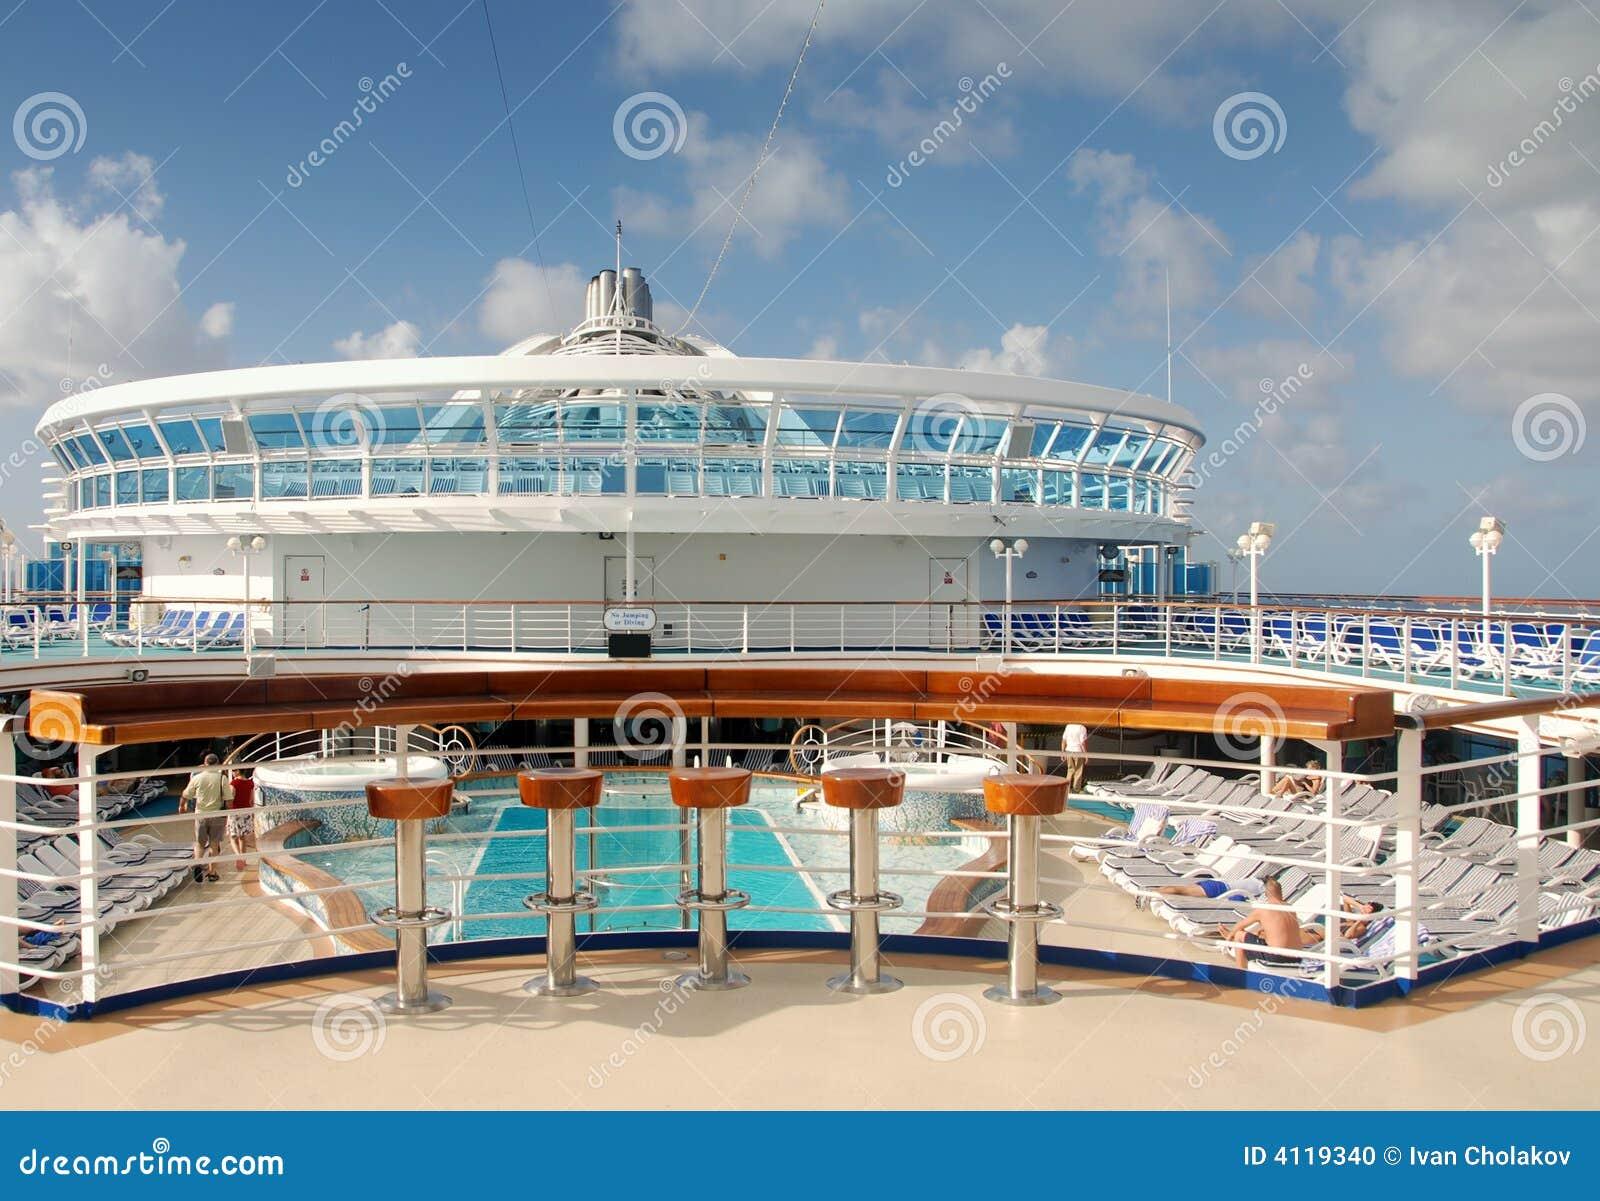 Cruise ship pool